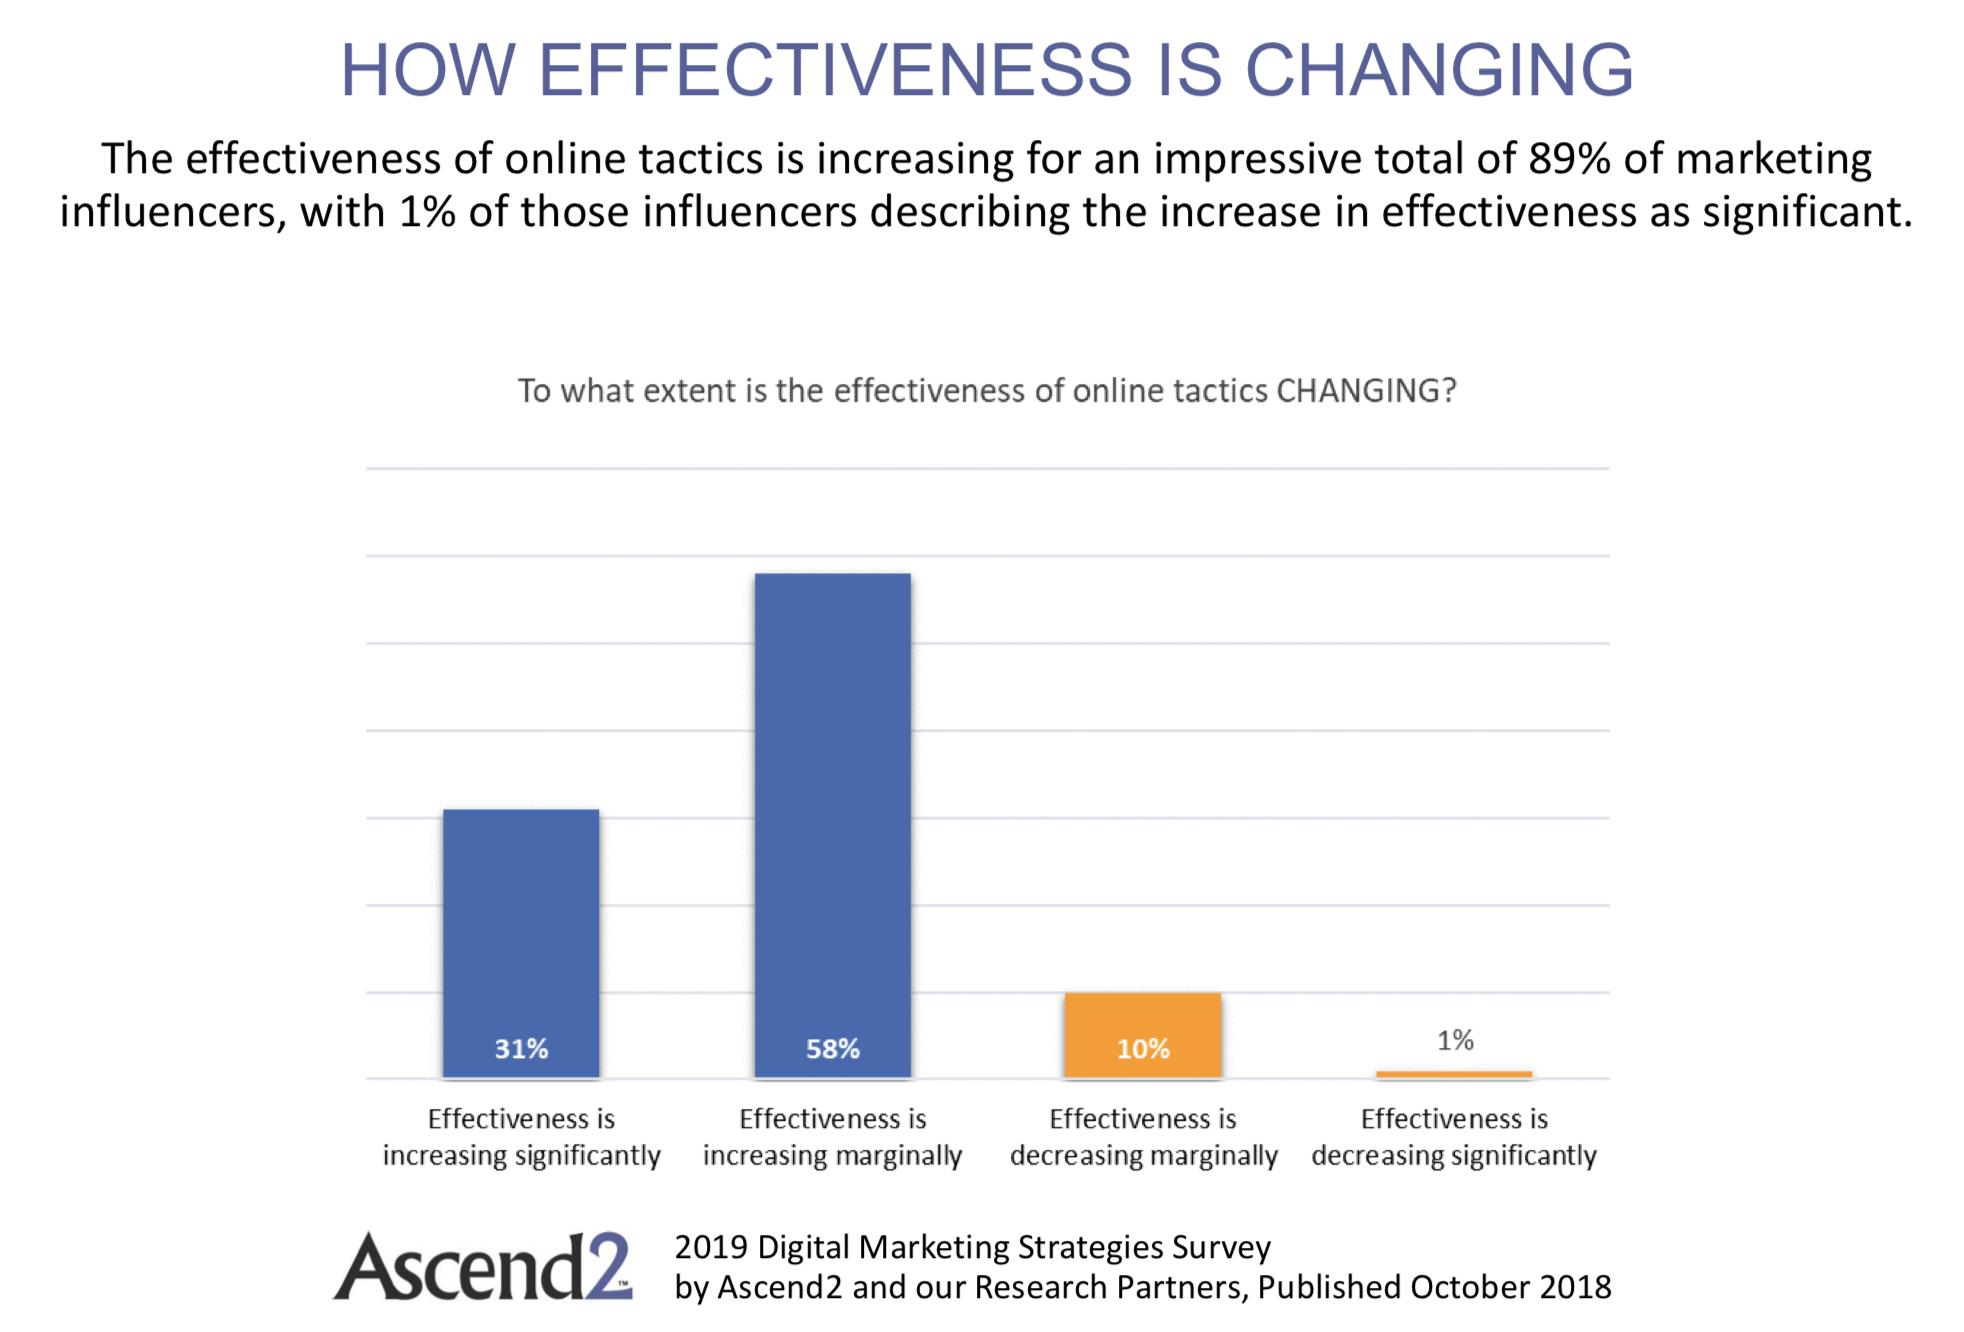 efficacia digitale